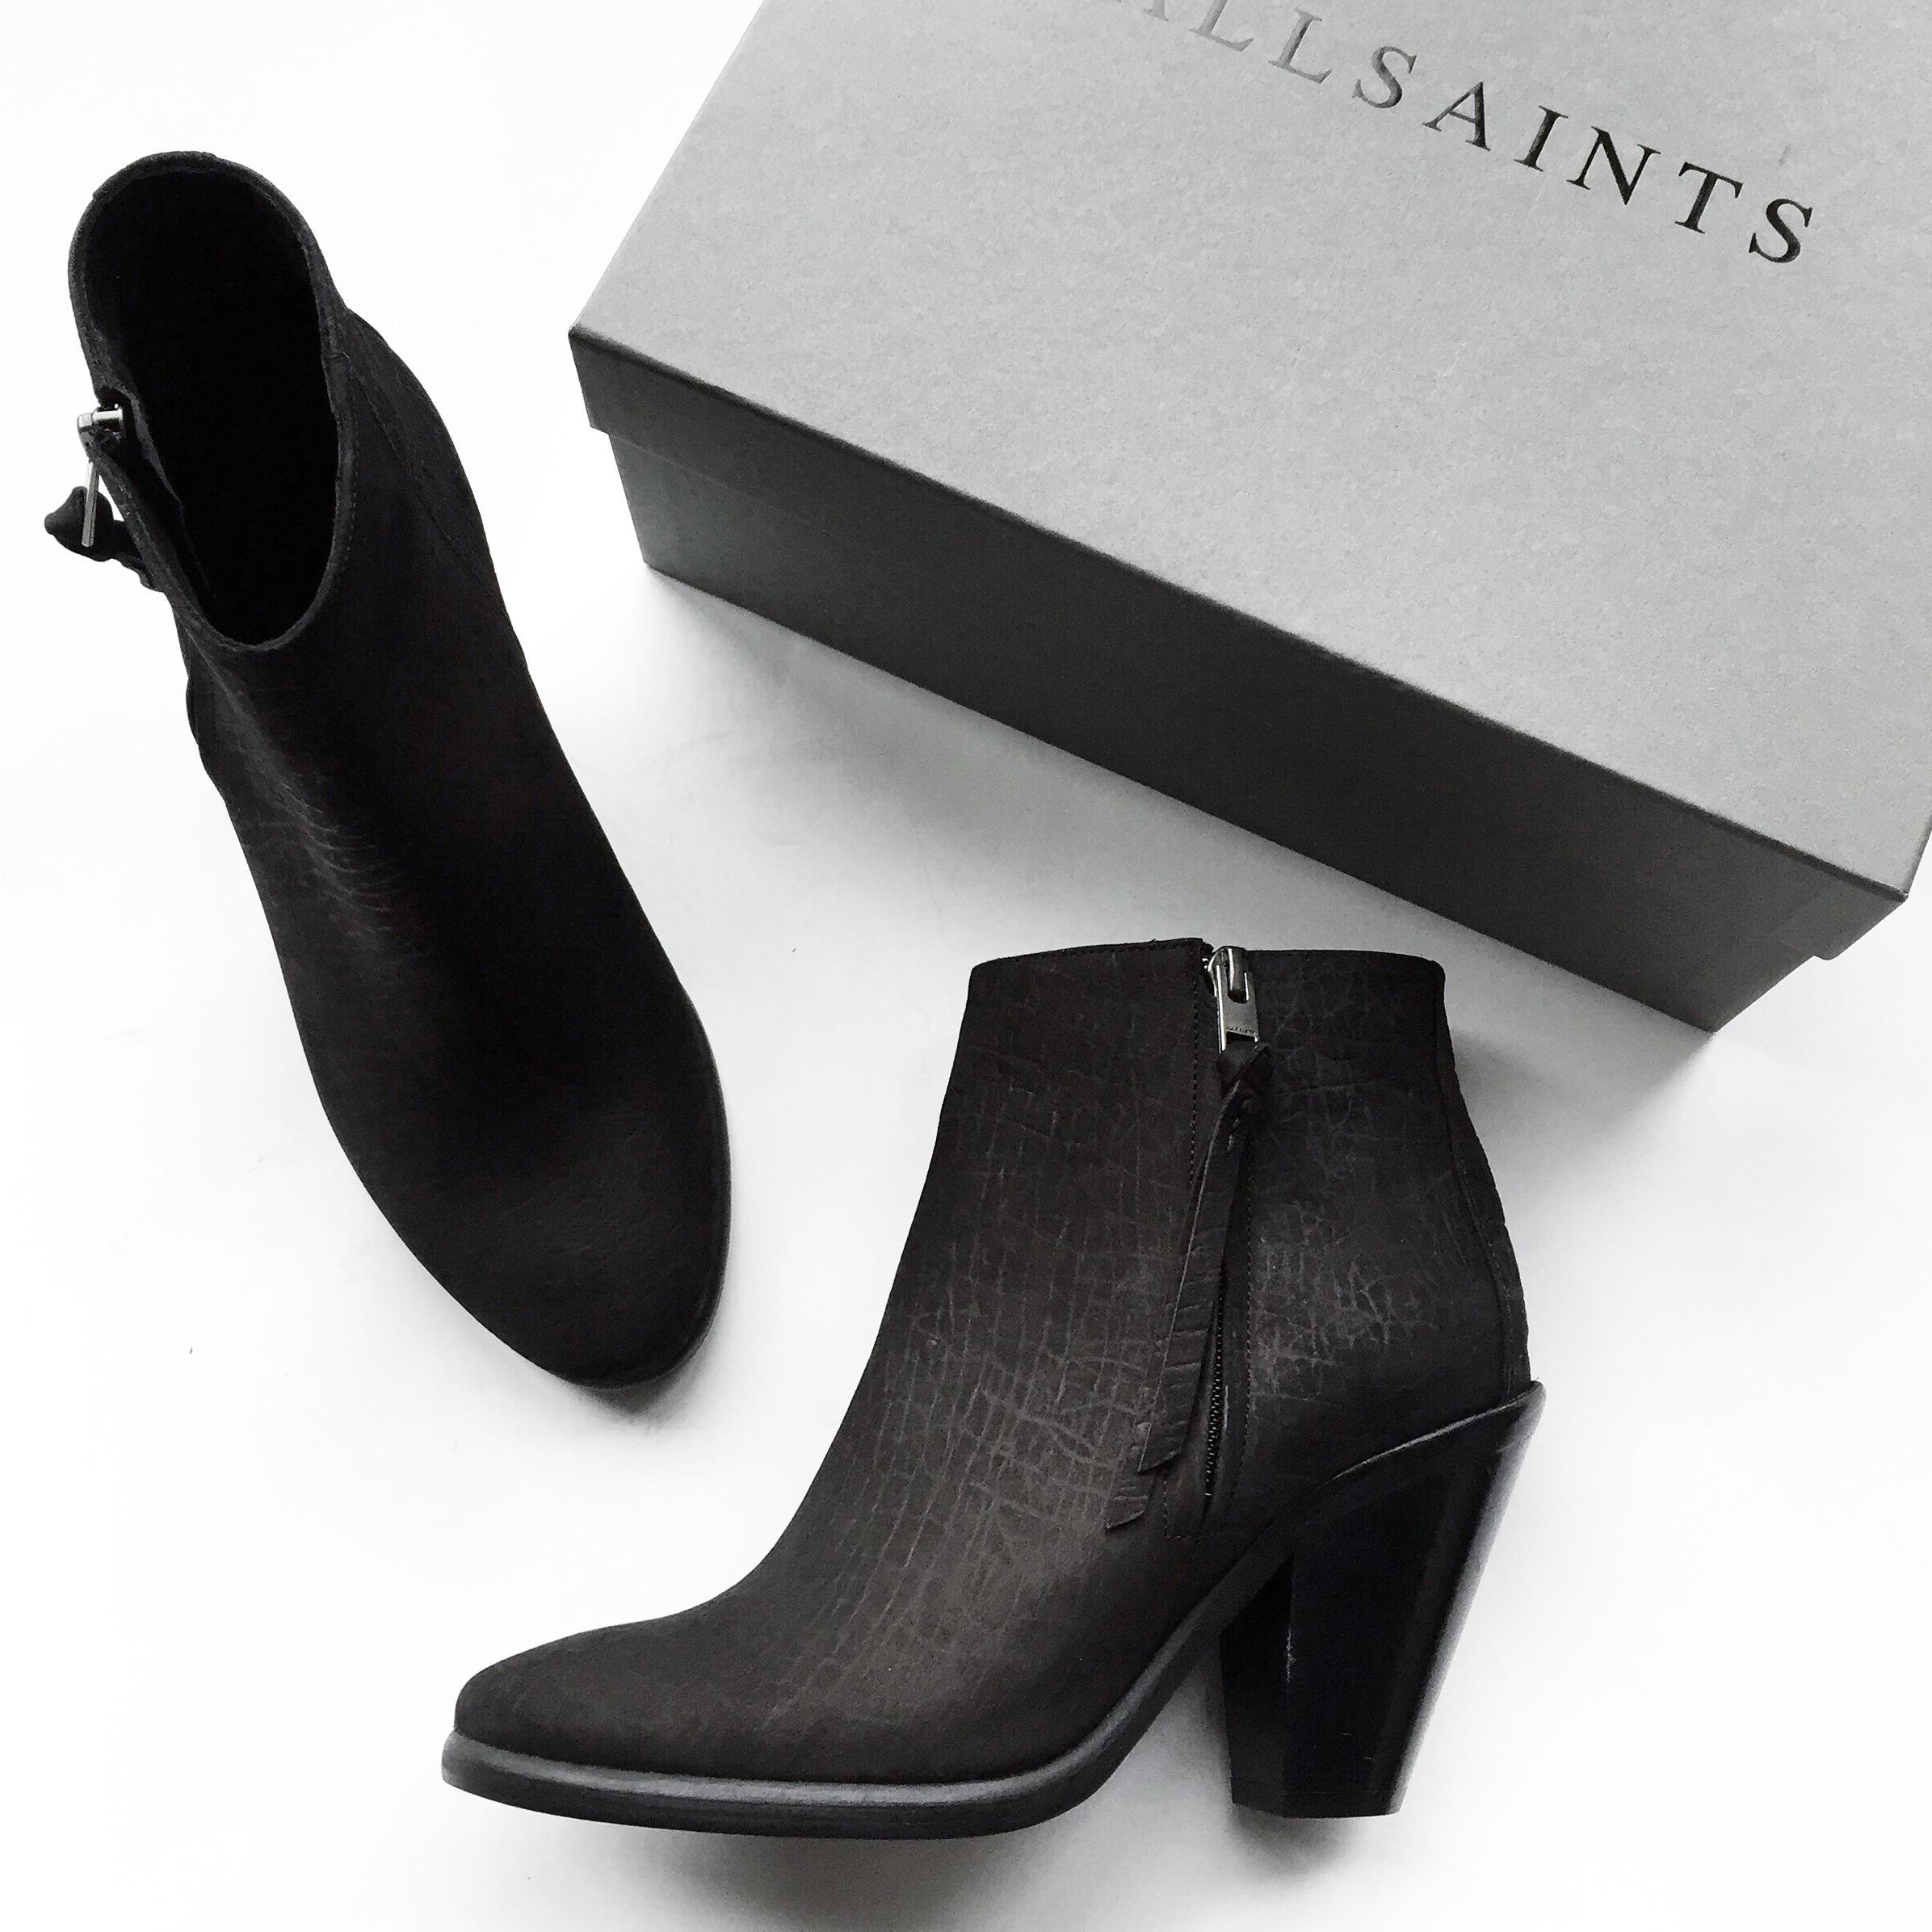 All Saints New Jonas Boot